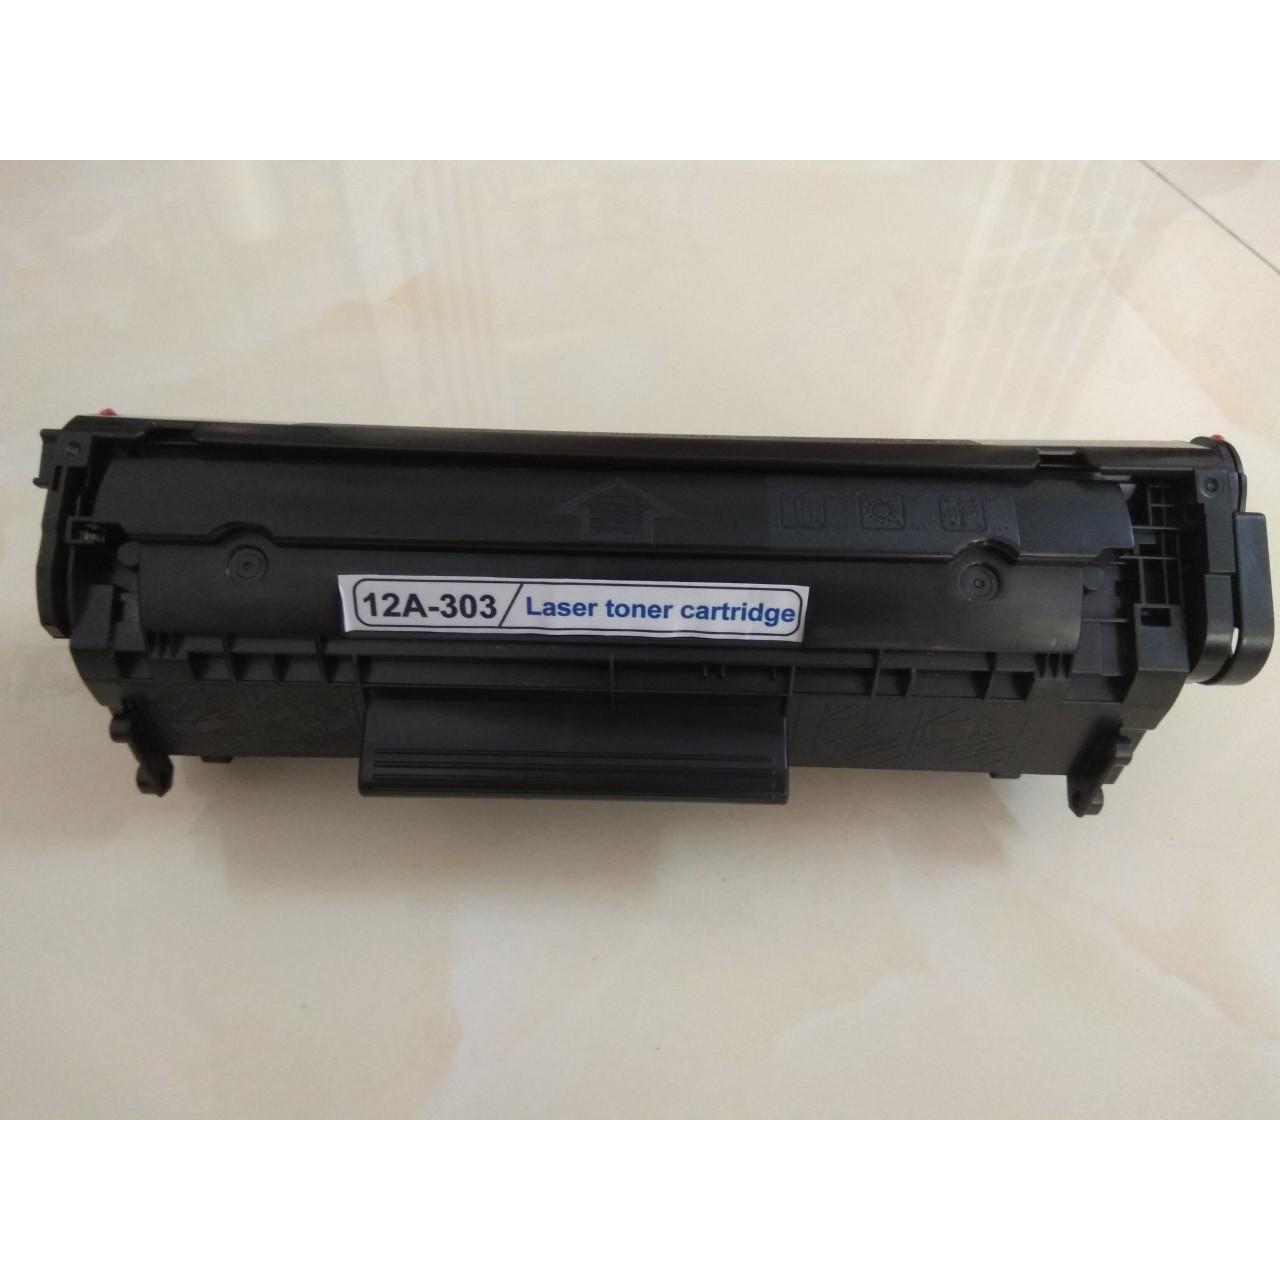 [Bộ 6 hôp]Hộp mực Canon LBP 2900, 3000, HP3050, 3055 | Hộp mực 12A-303